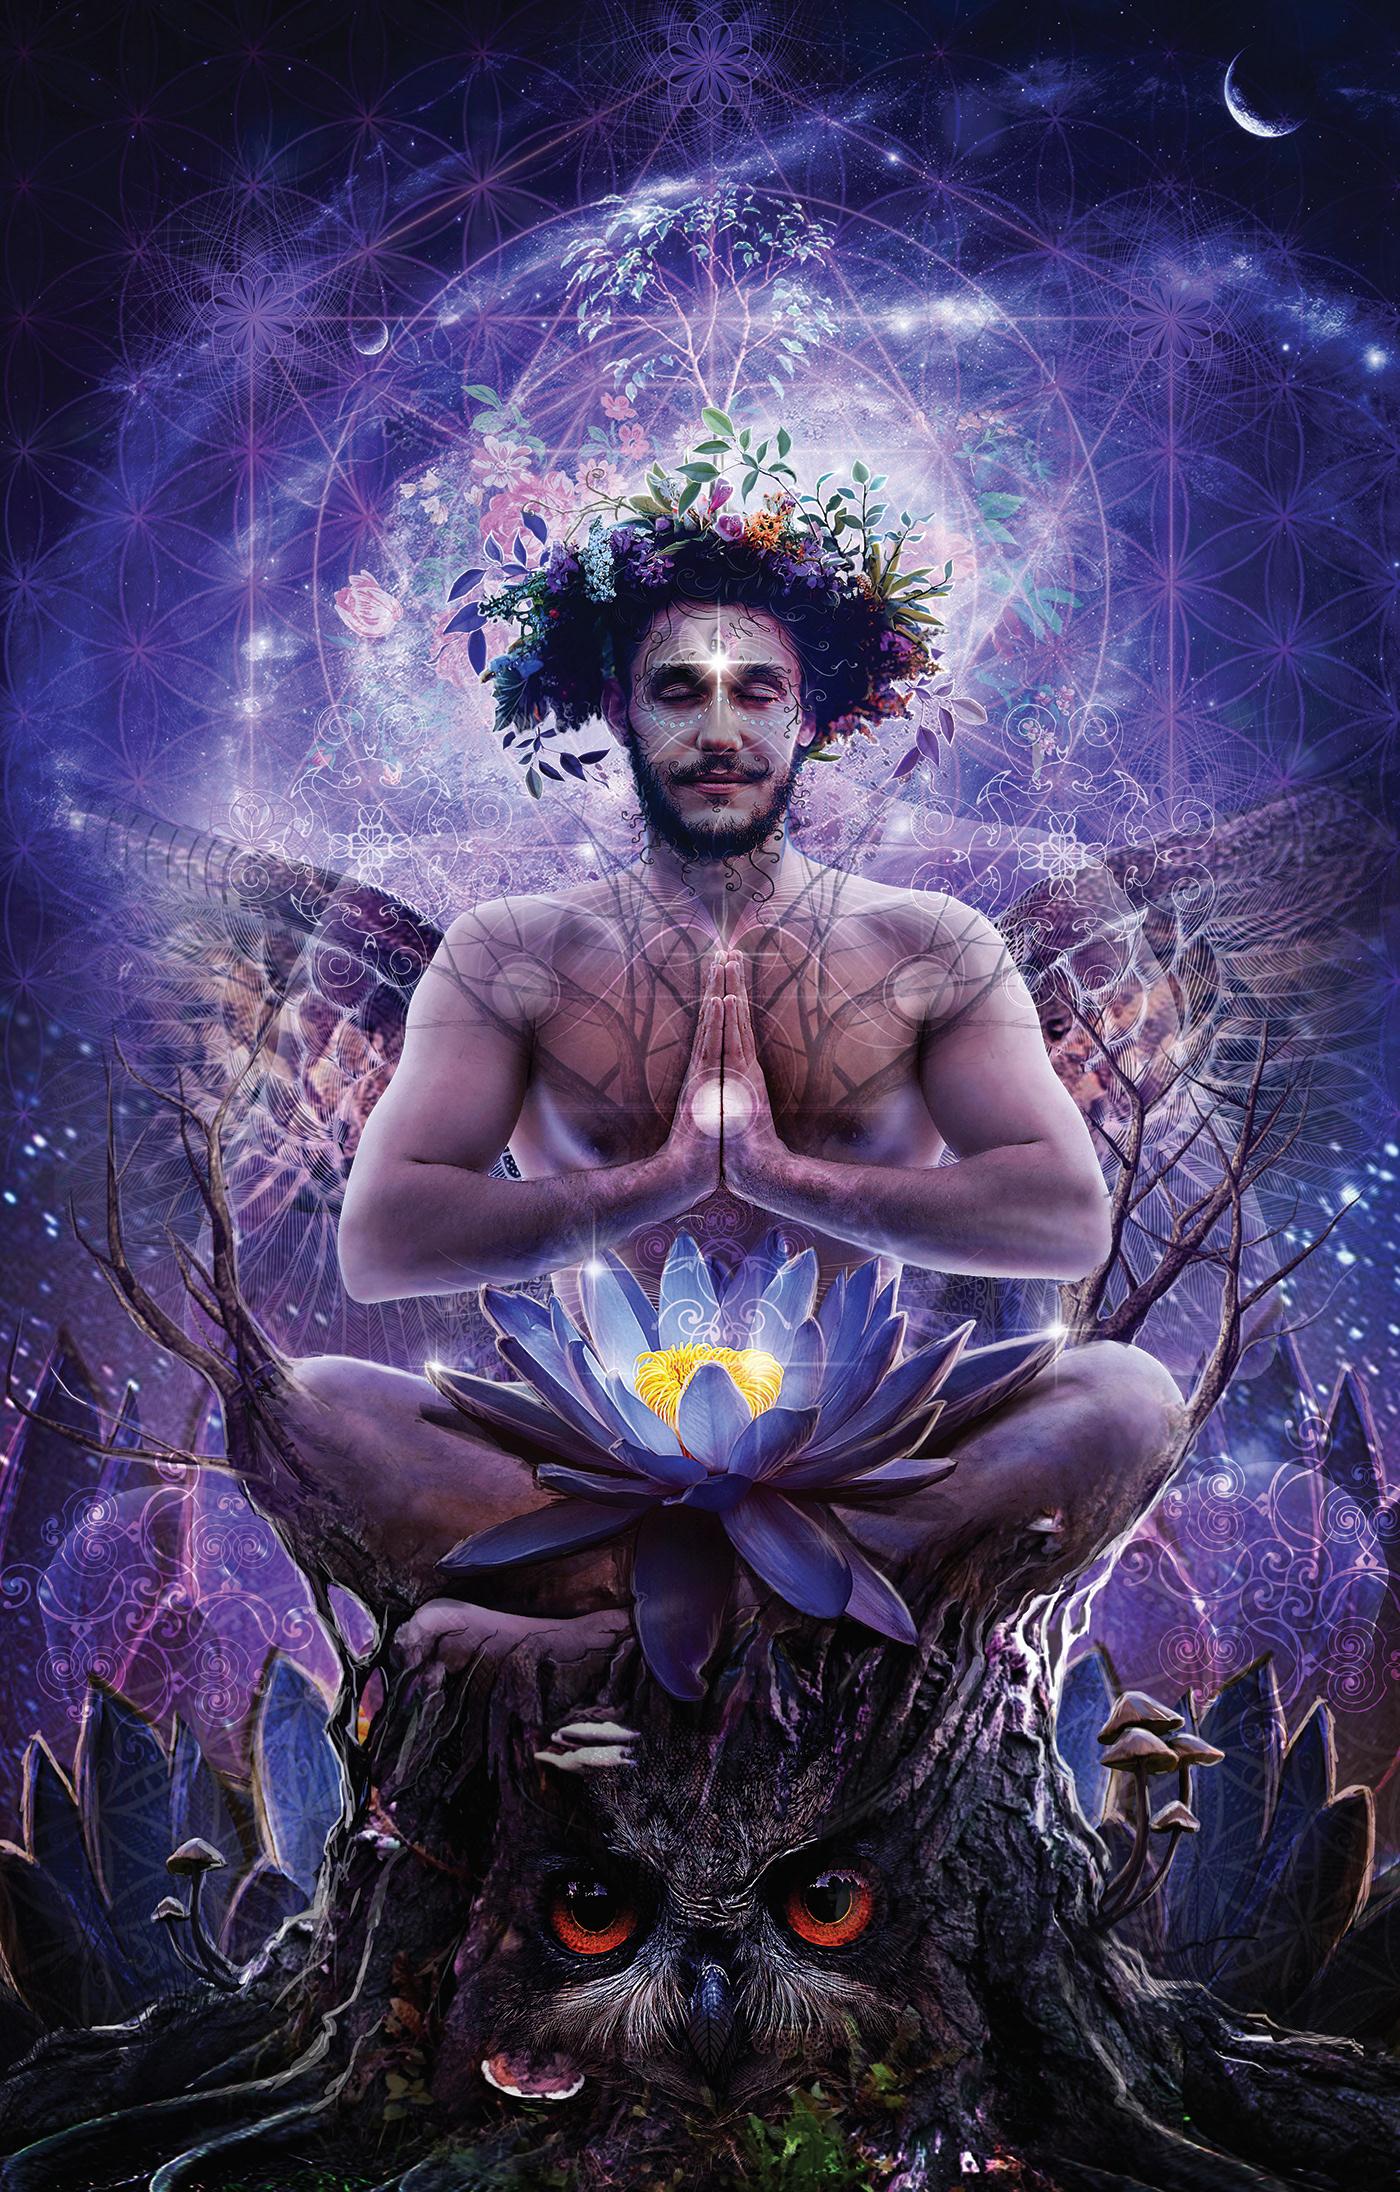 art digitalart fantasy Lotus Mattepainting sacred spirit